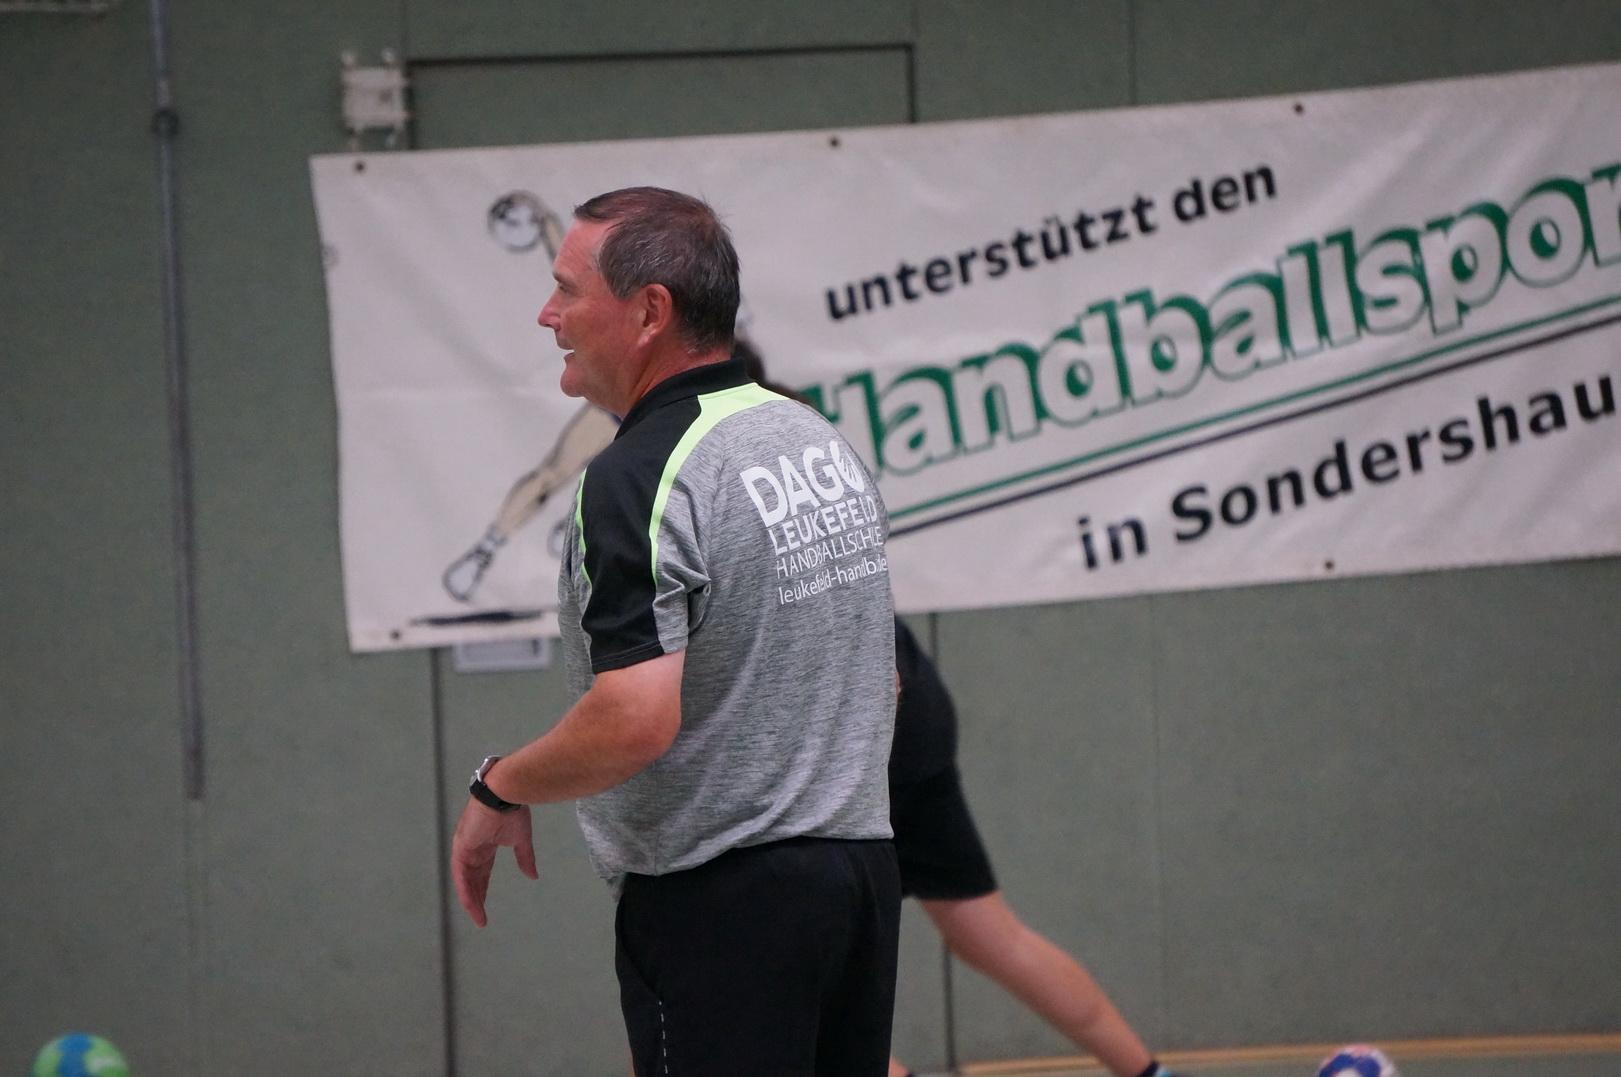 201808_Handballcamp_SDH_MG_034w